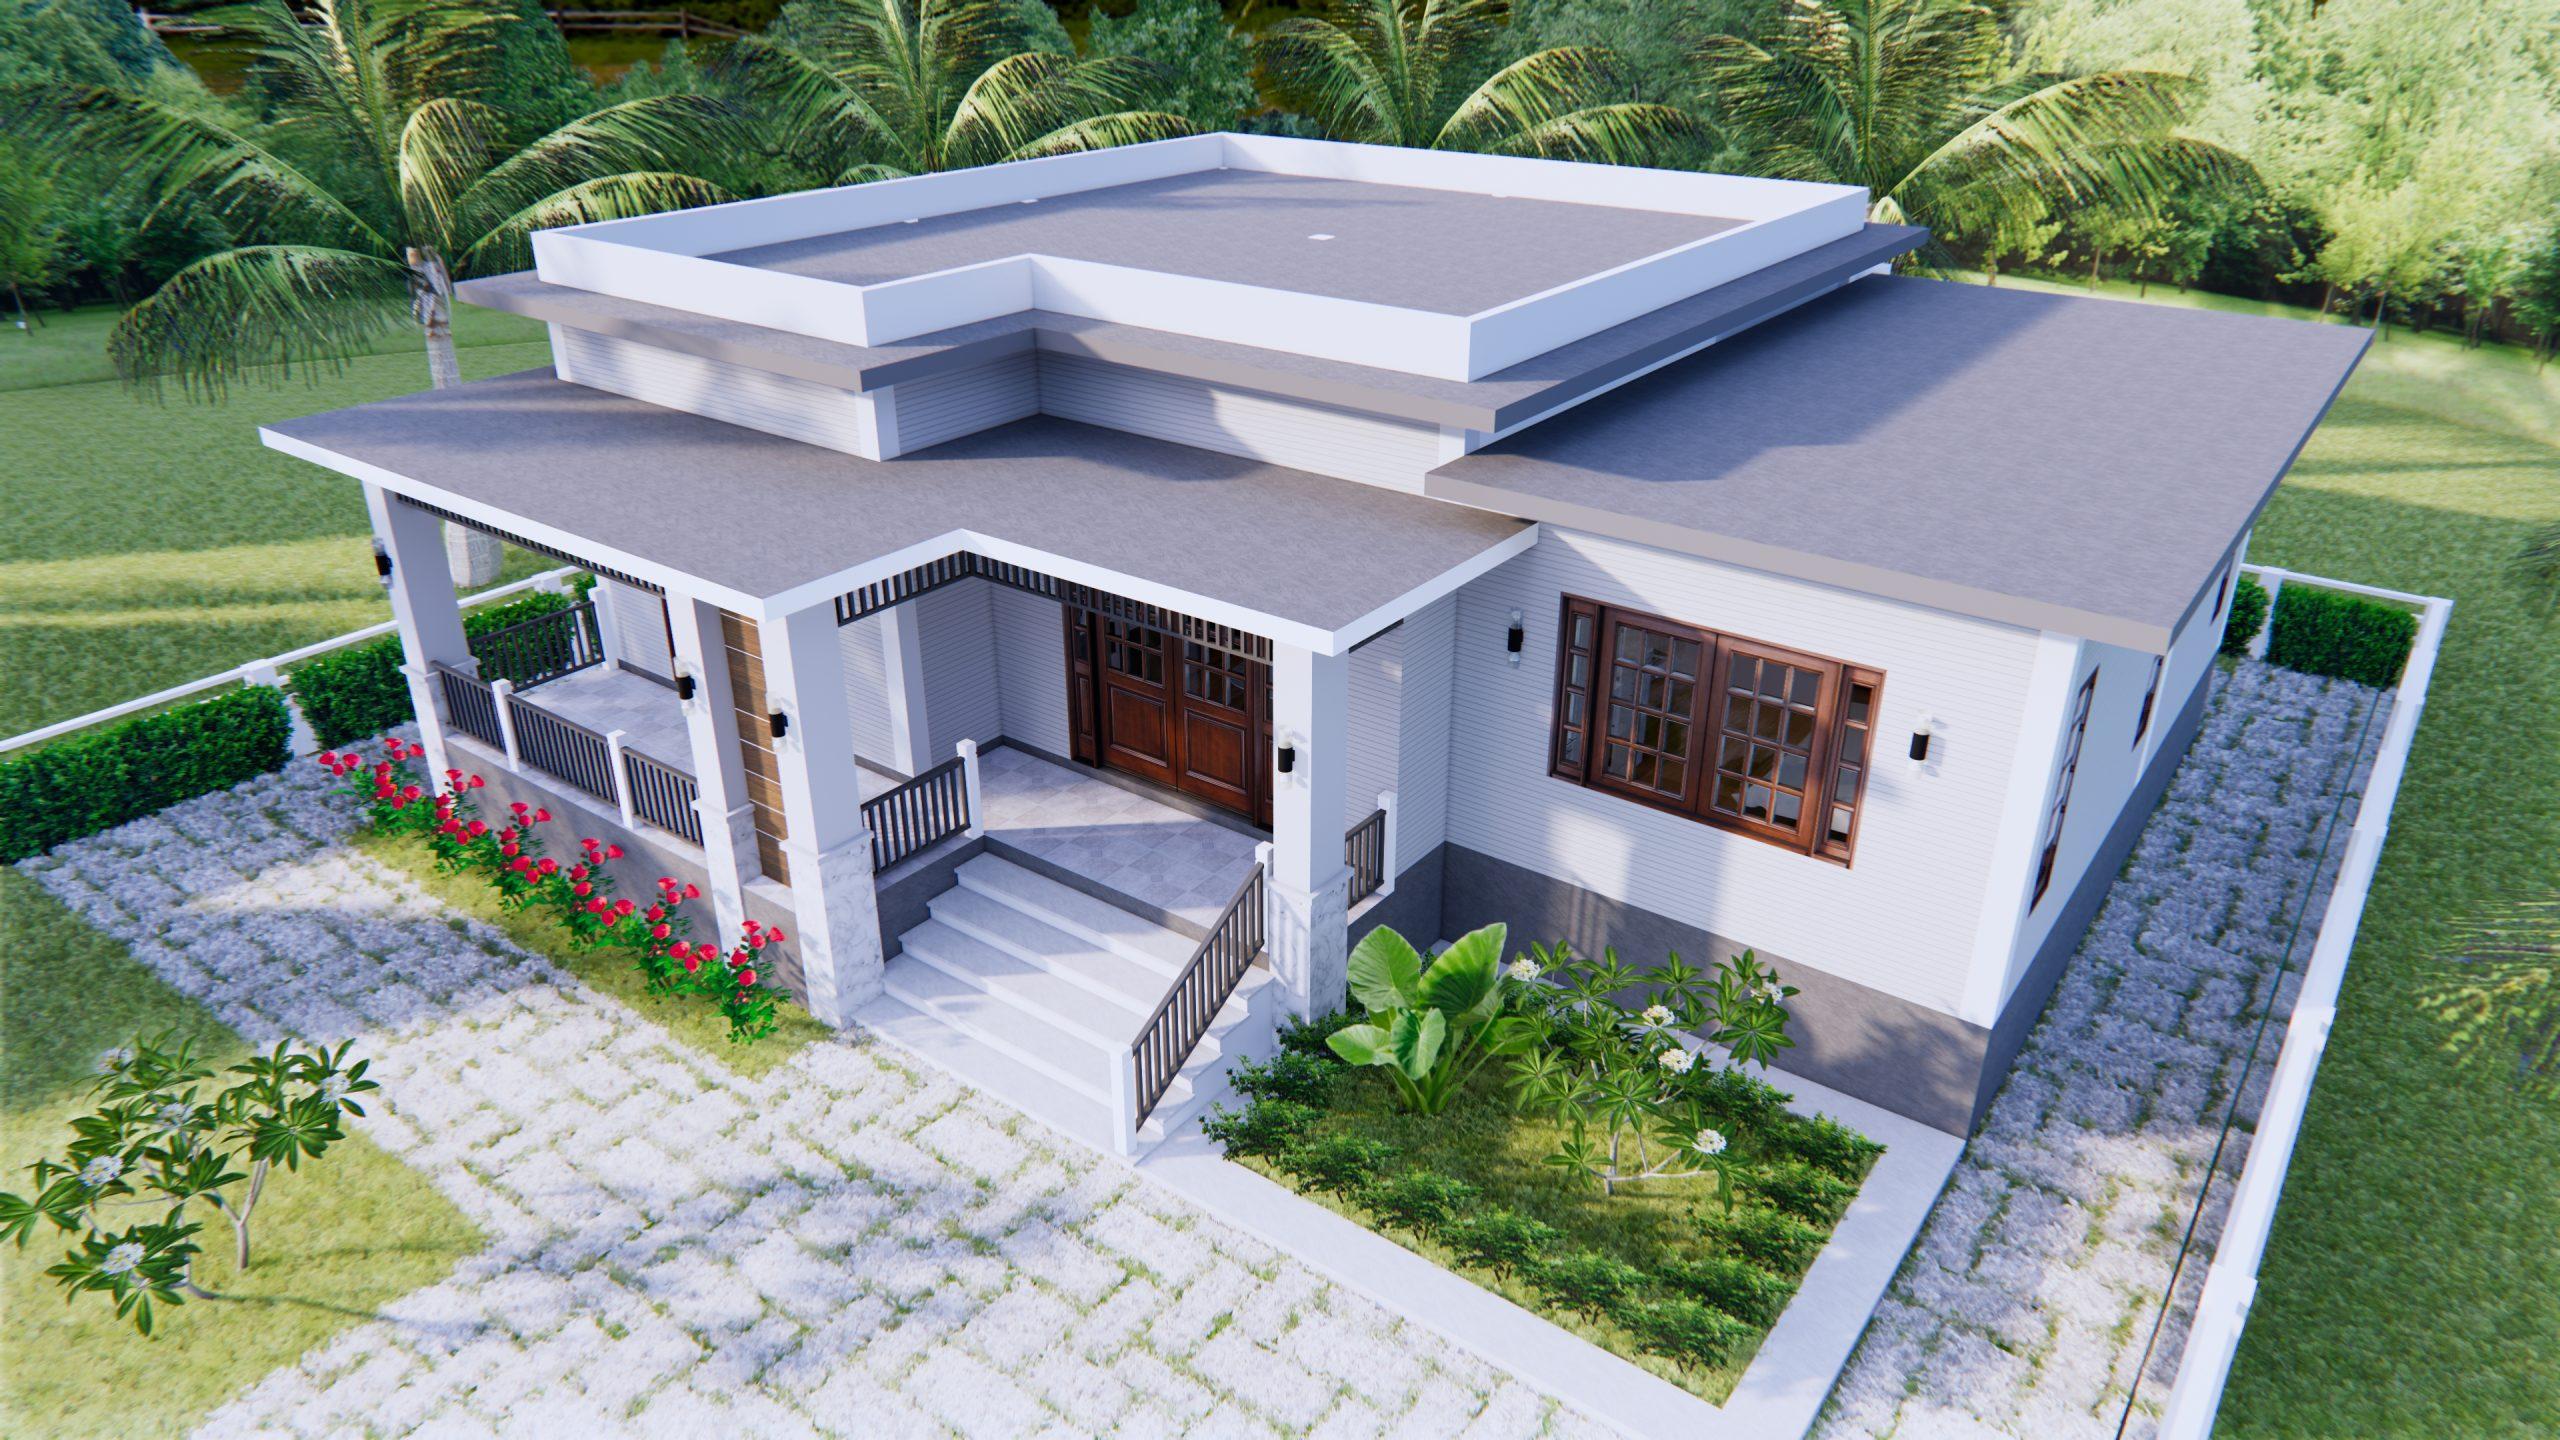 House Plan Drawing 12x11 Meter 39x36 Feet 3 Beds 5